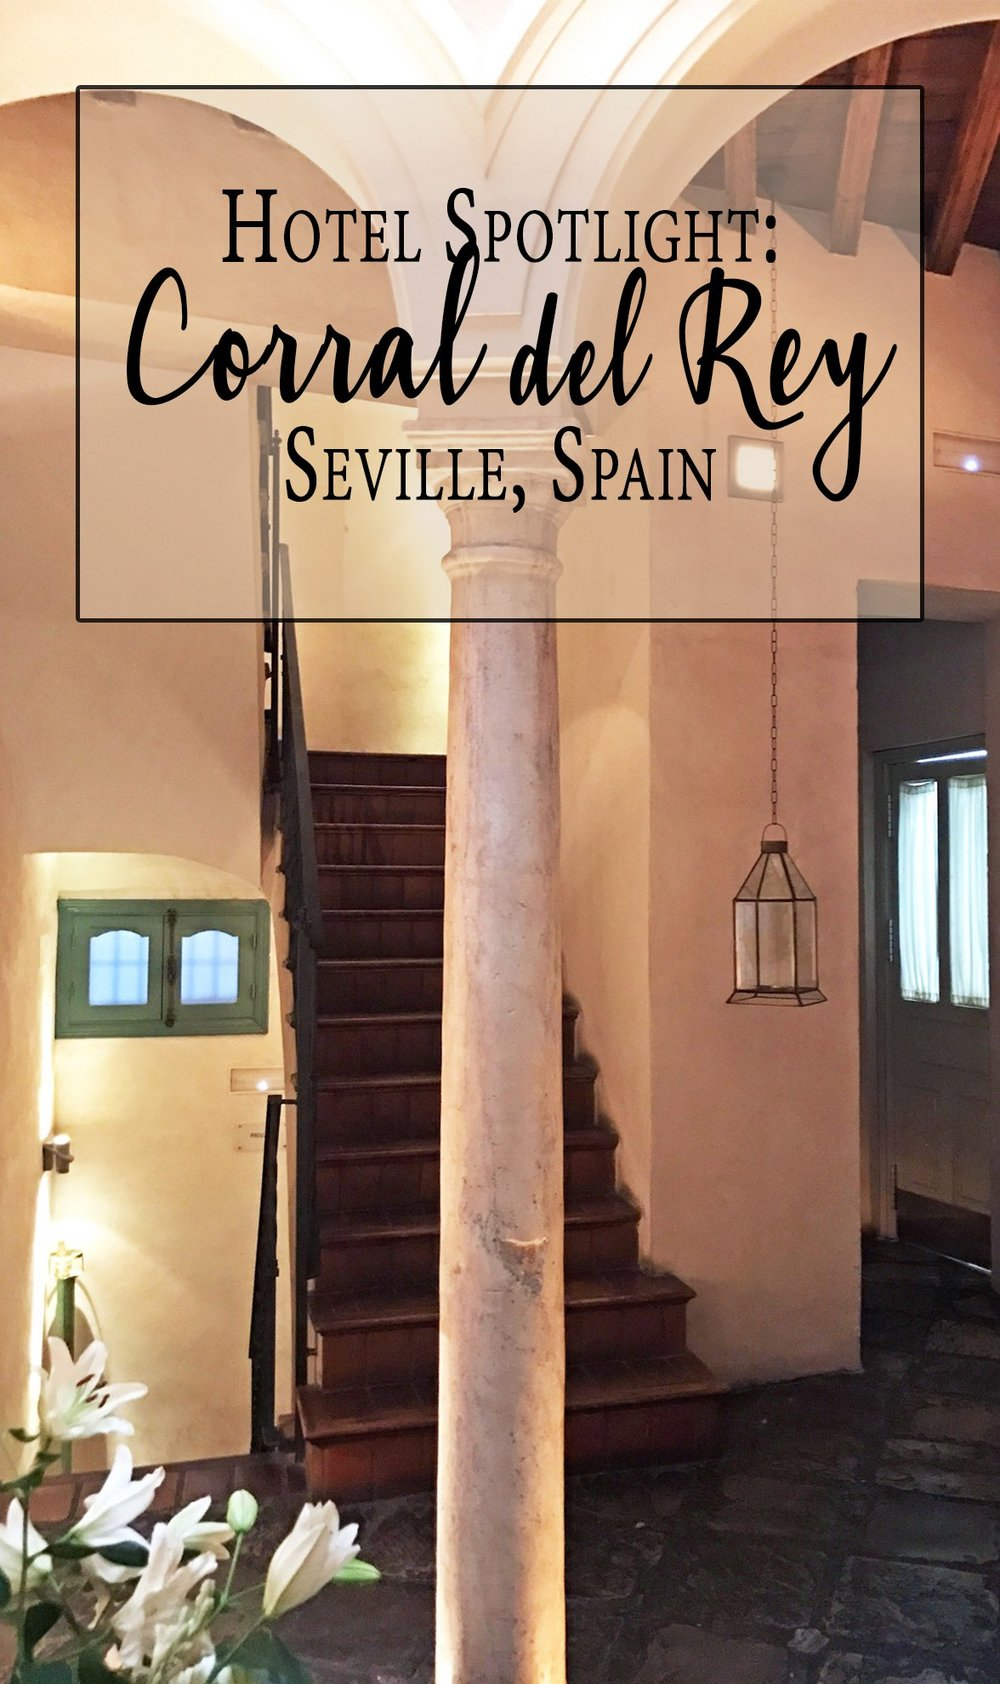 Seville Spain Corral del Rey hotel spotlight.jpg